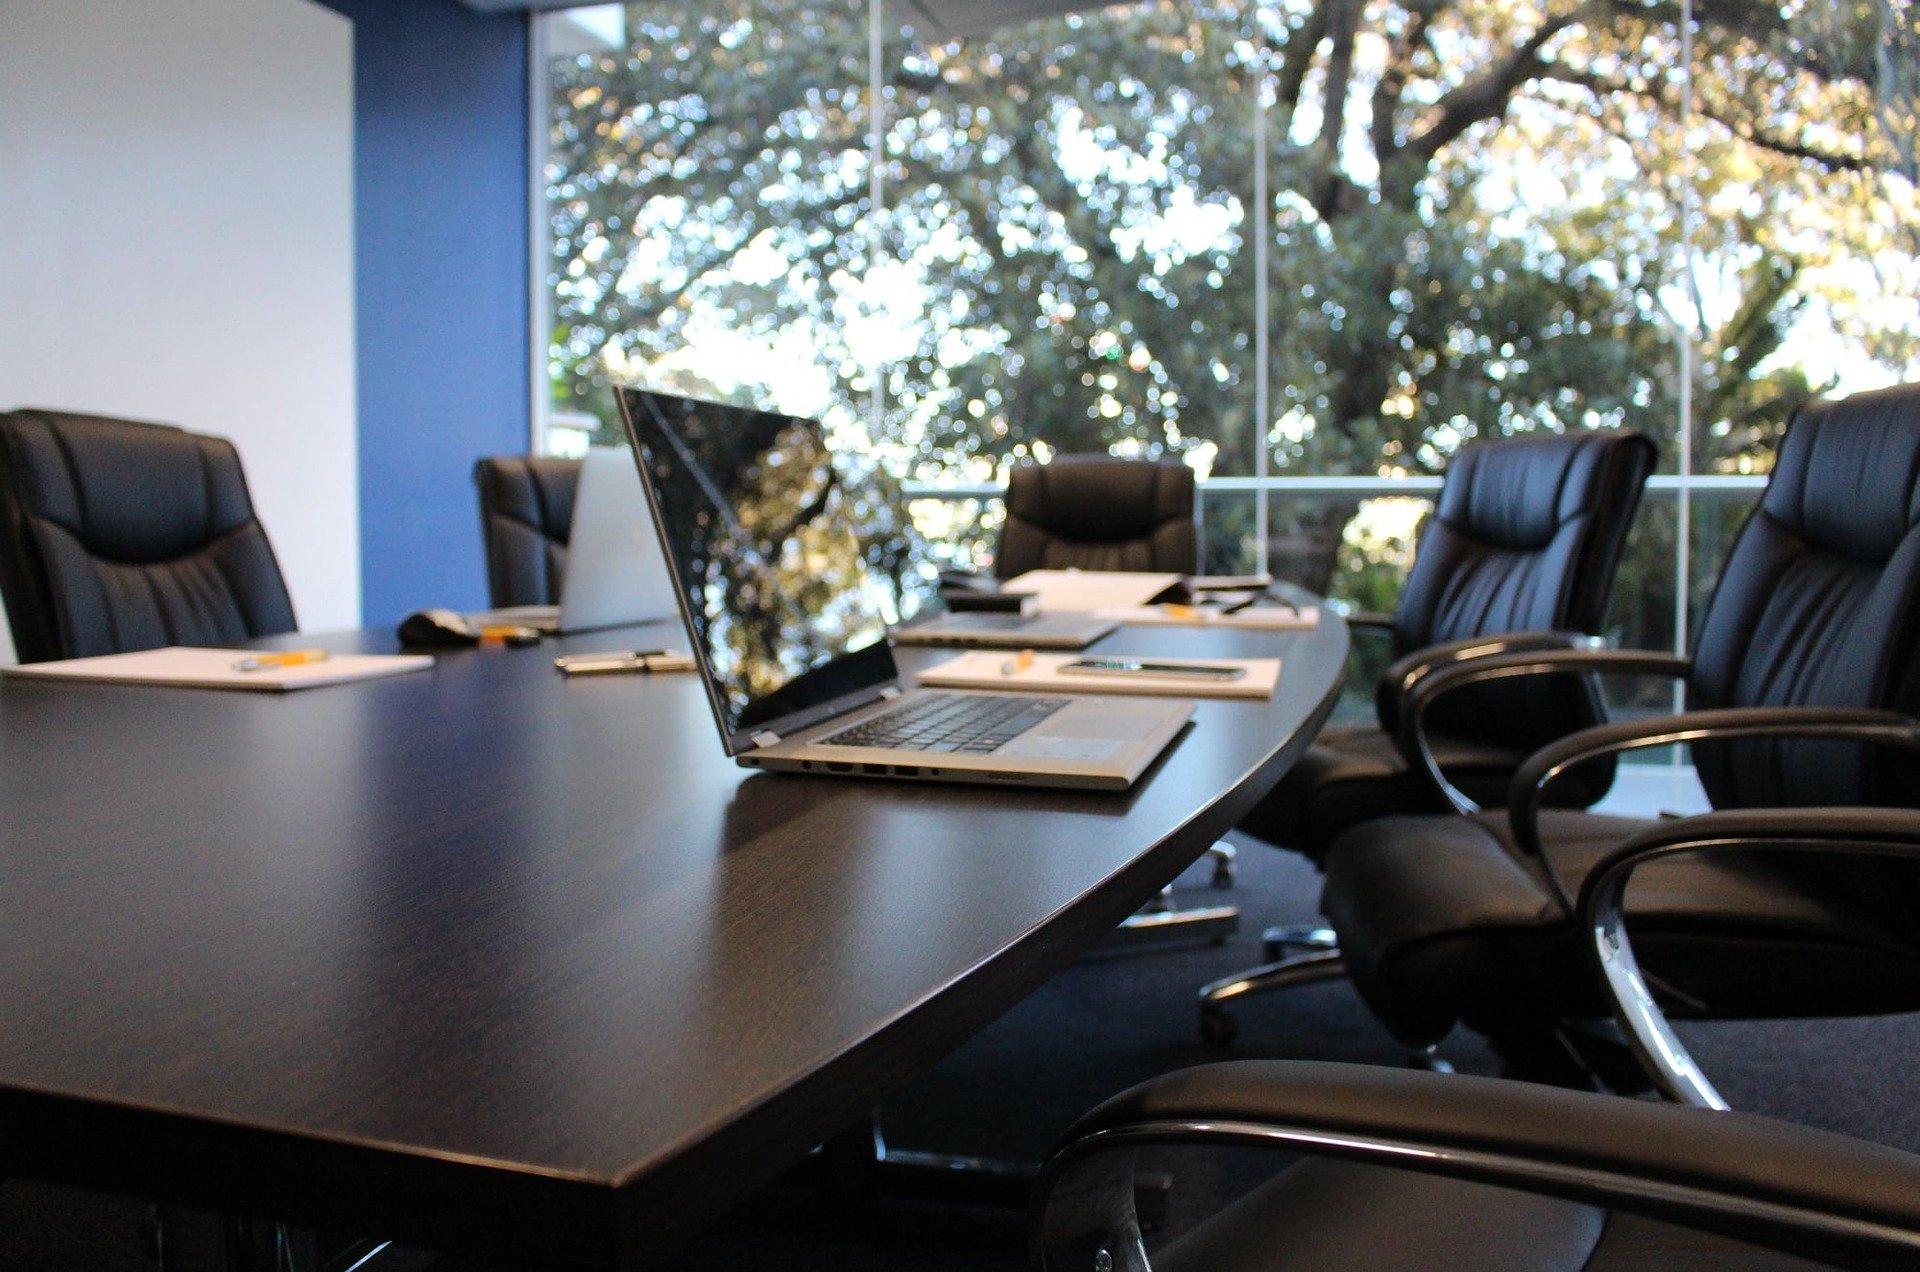 29th ERI SEE Governing Board Meeting Organised On 03 November 2020